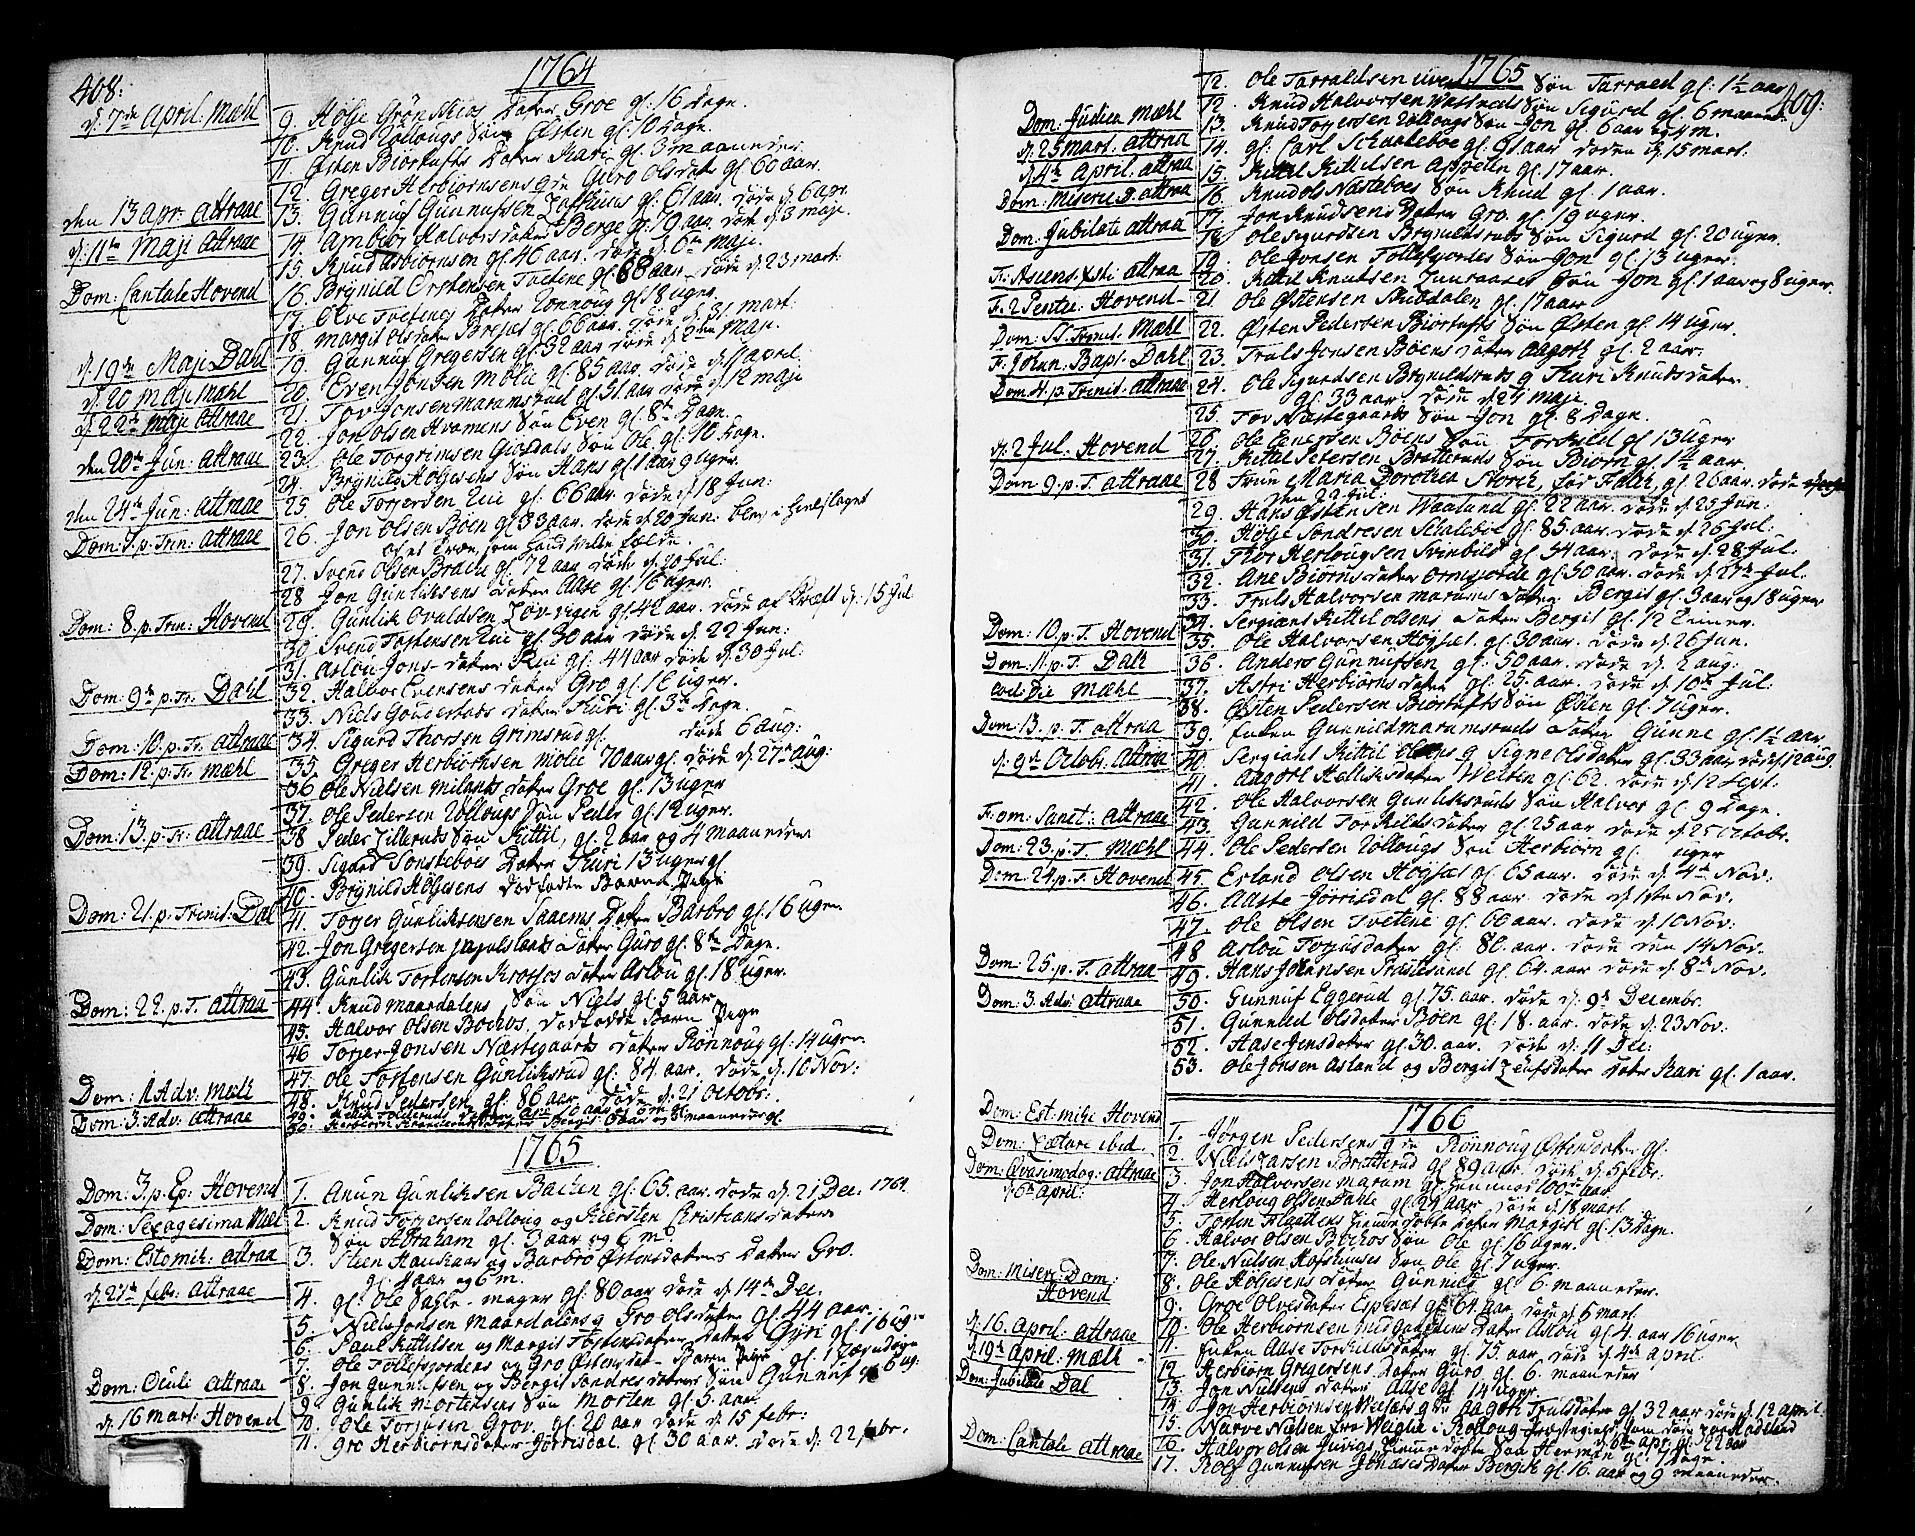 SAKO, Tinn kirkebøker, F/Fa/L0002: Ministerialbok nr. I 2, 1757-1810, s. 408-409